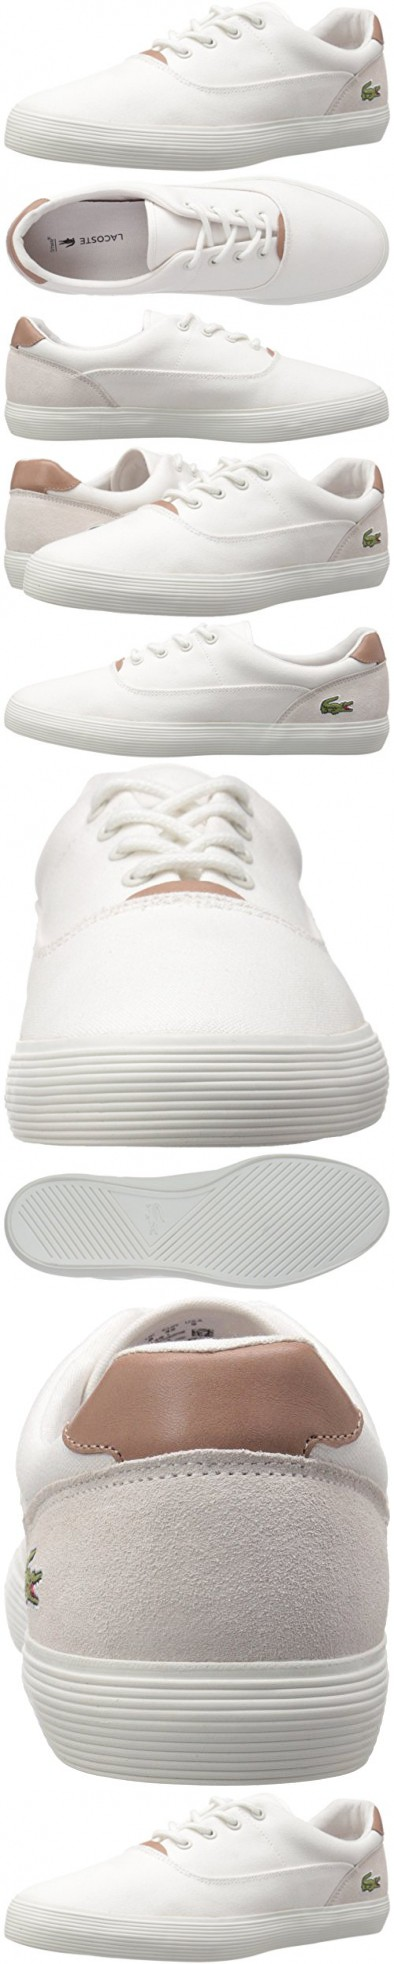 805d0c49e Lacoste Men s Jouer 316 1 Cam Sneaker